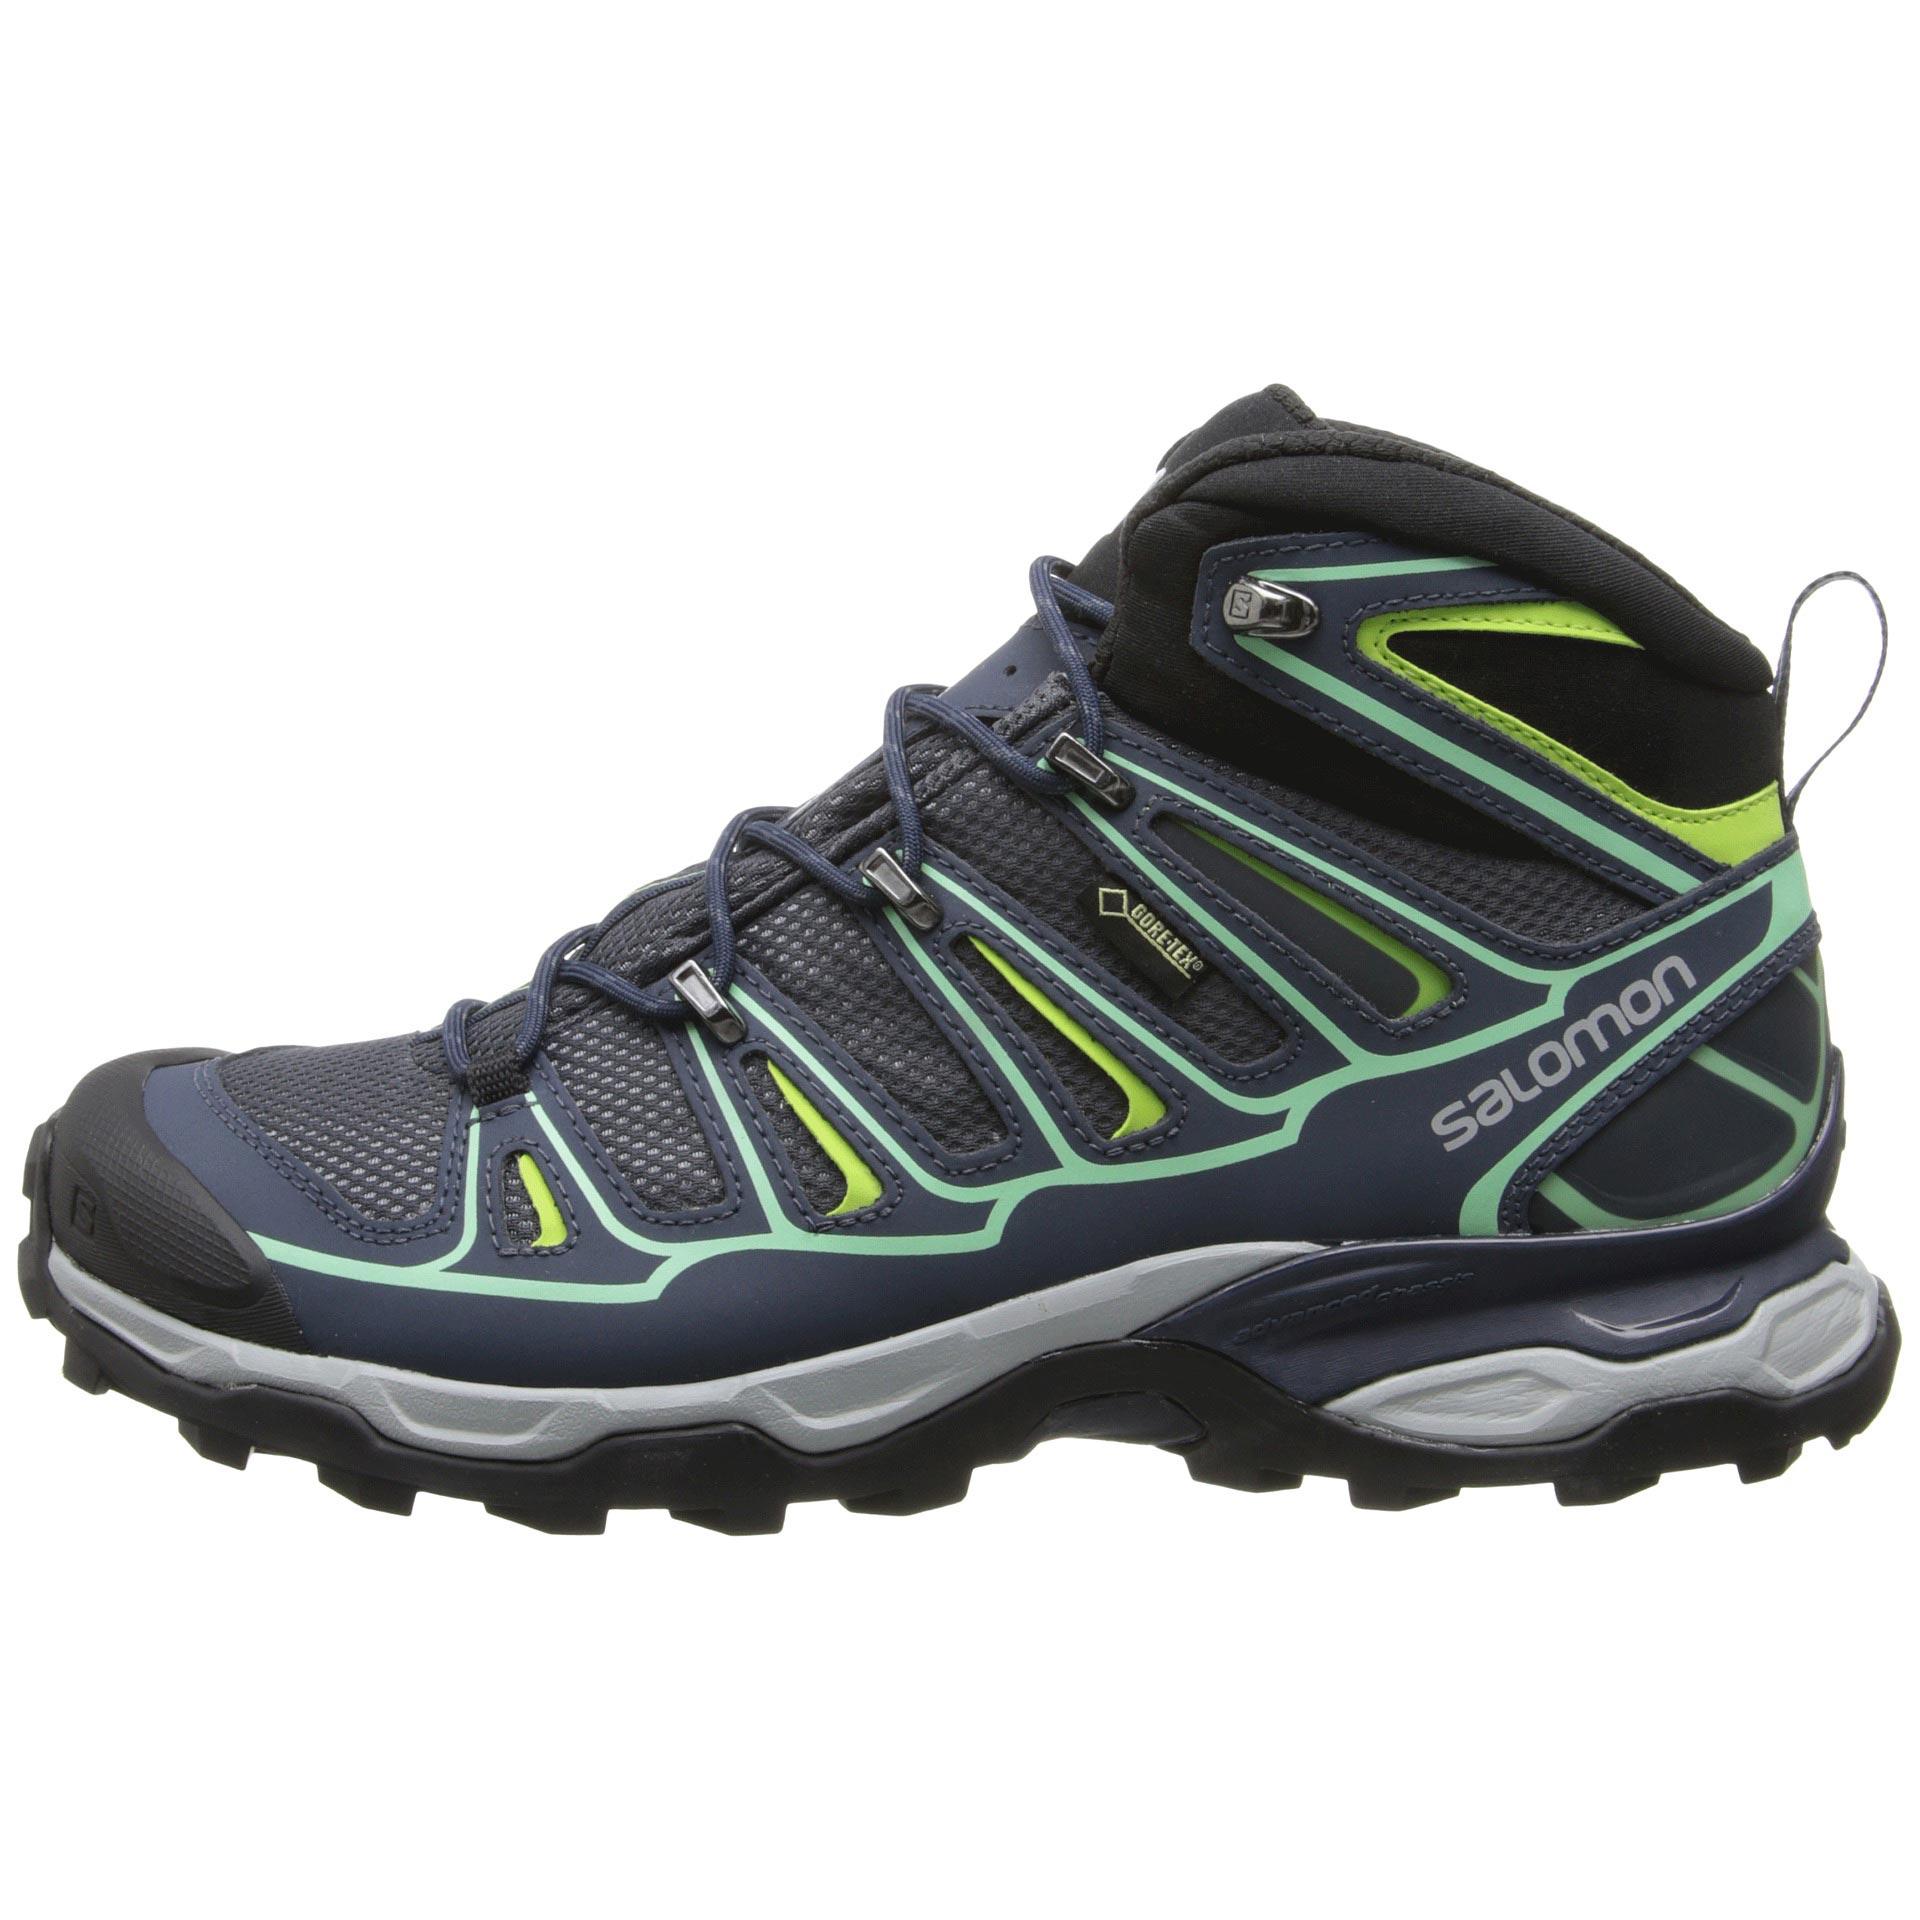 Outdoor Gris Salomon femmes X Ultra 3 Gore Tex chaussure